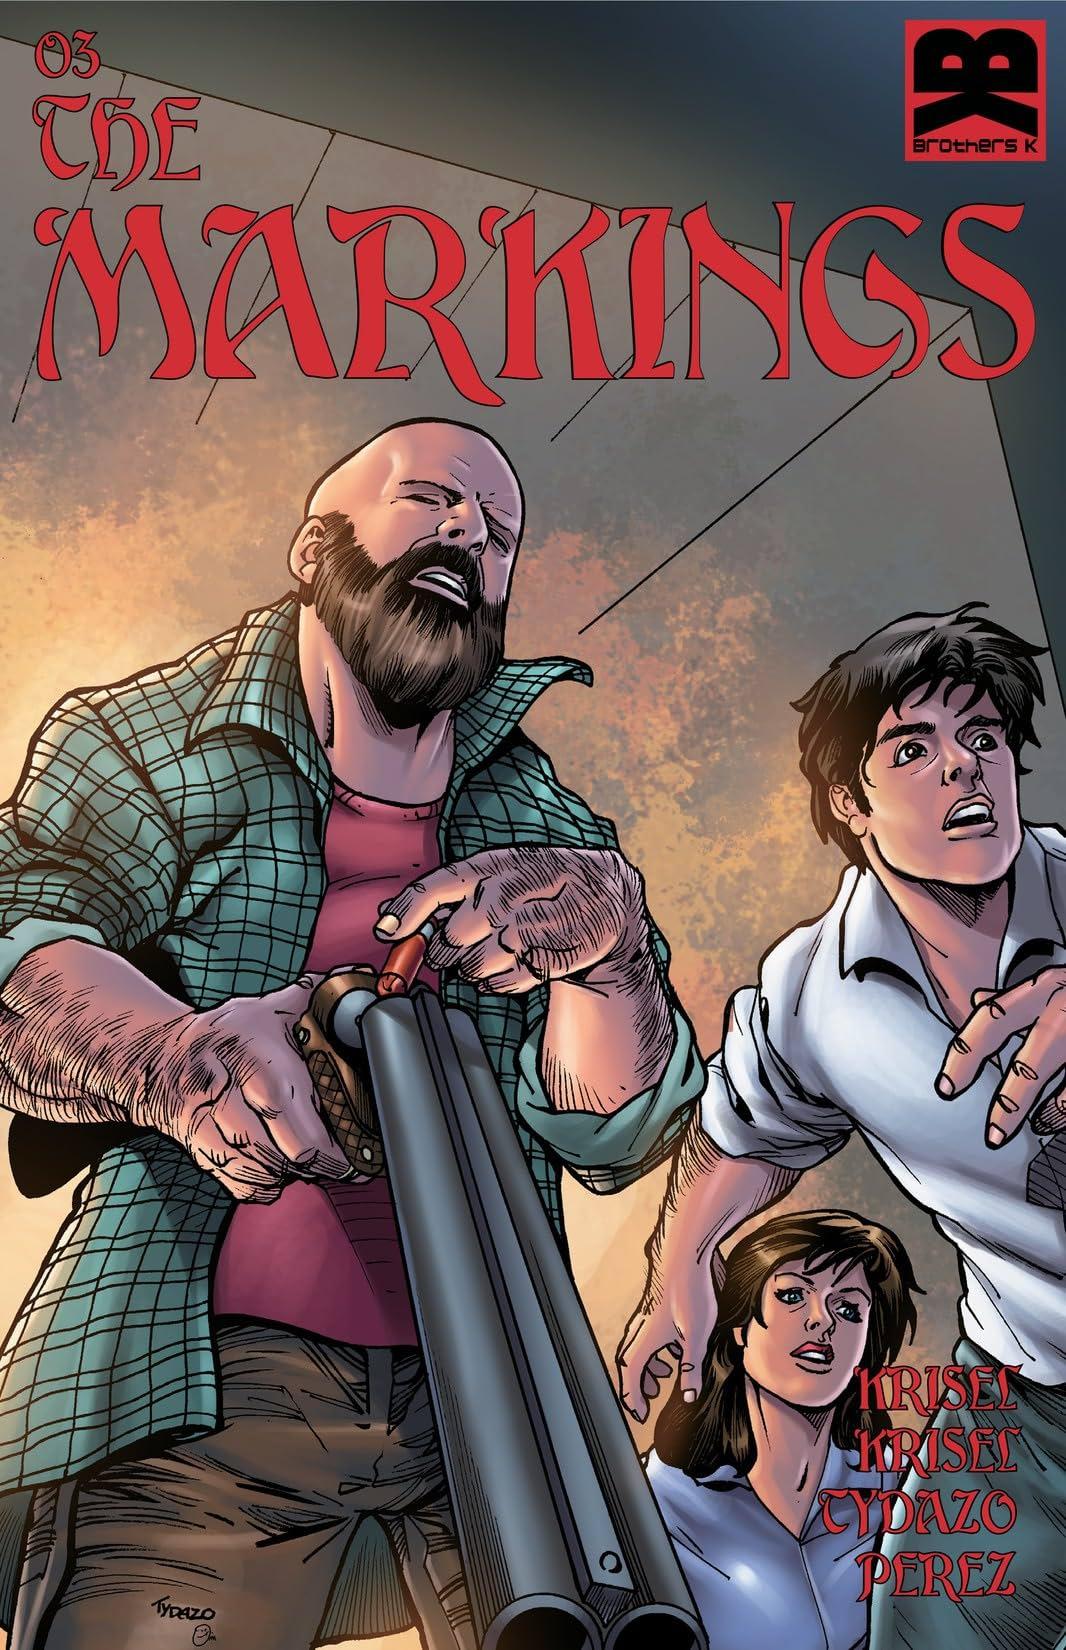 The Markings #3